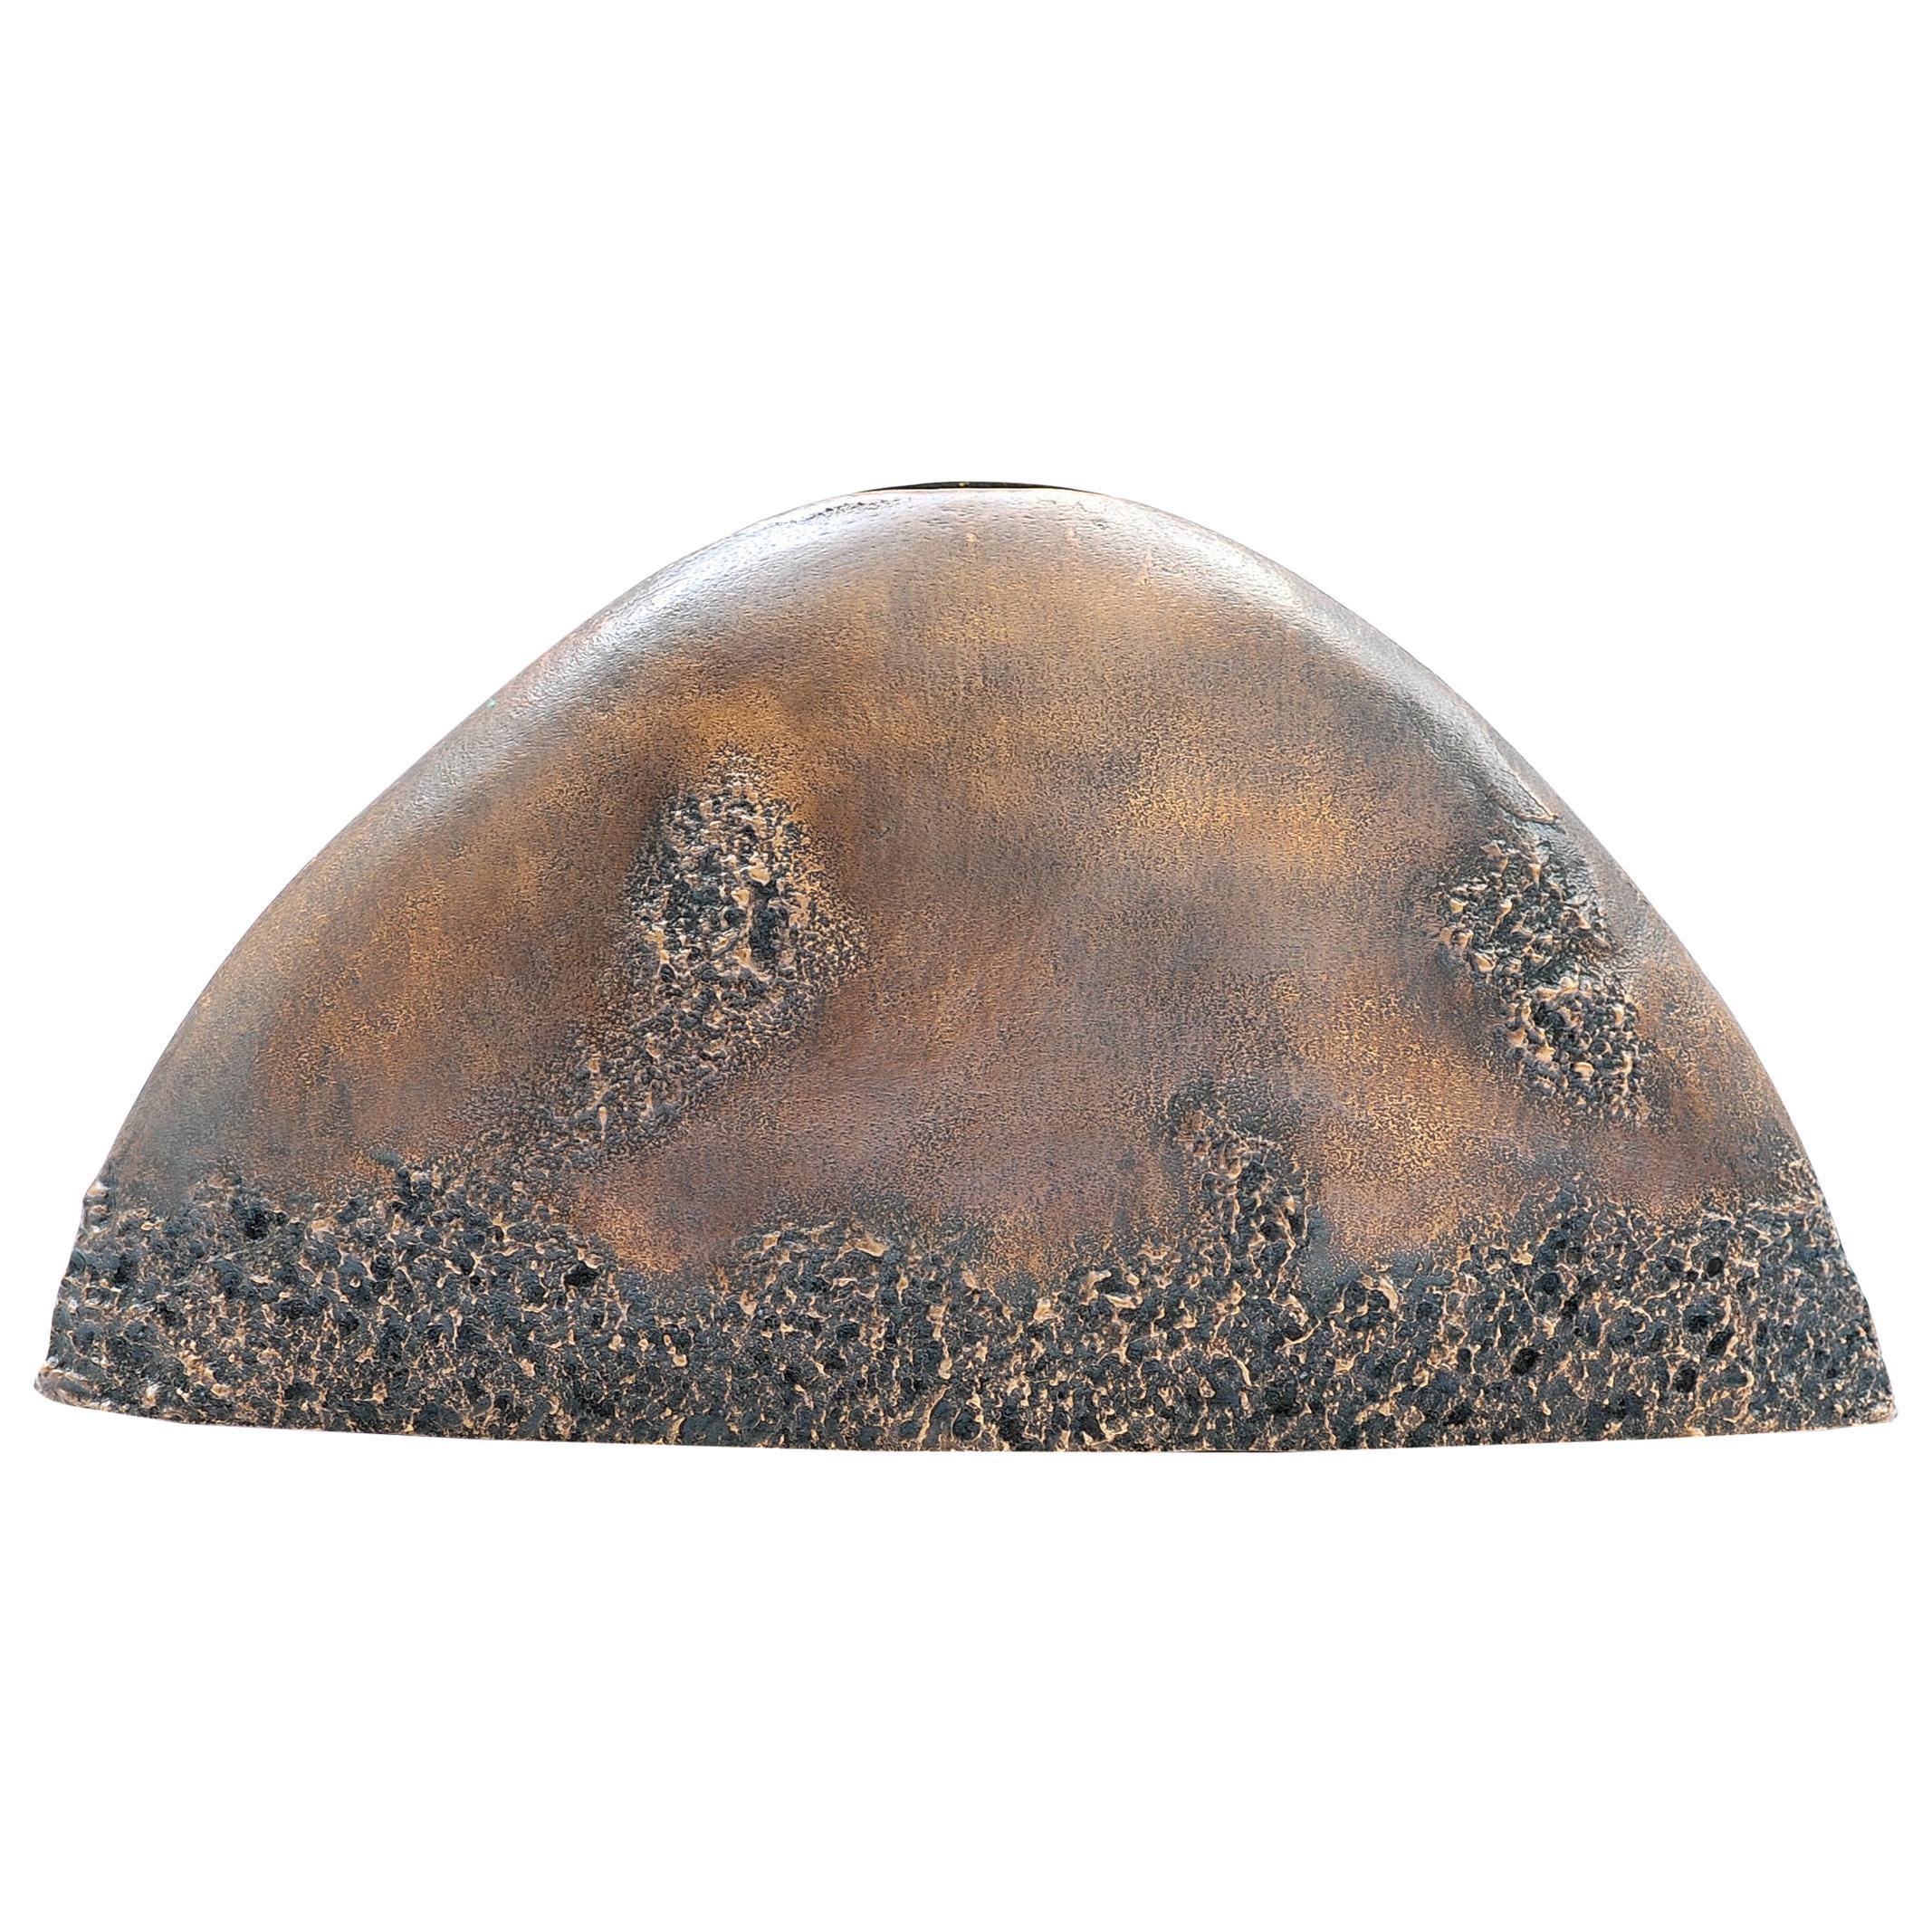 Vase in Dark Bronze by FAKASAKA Design